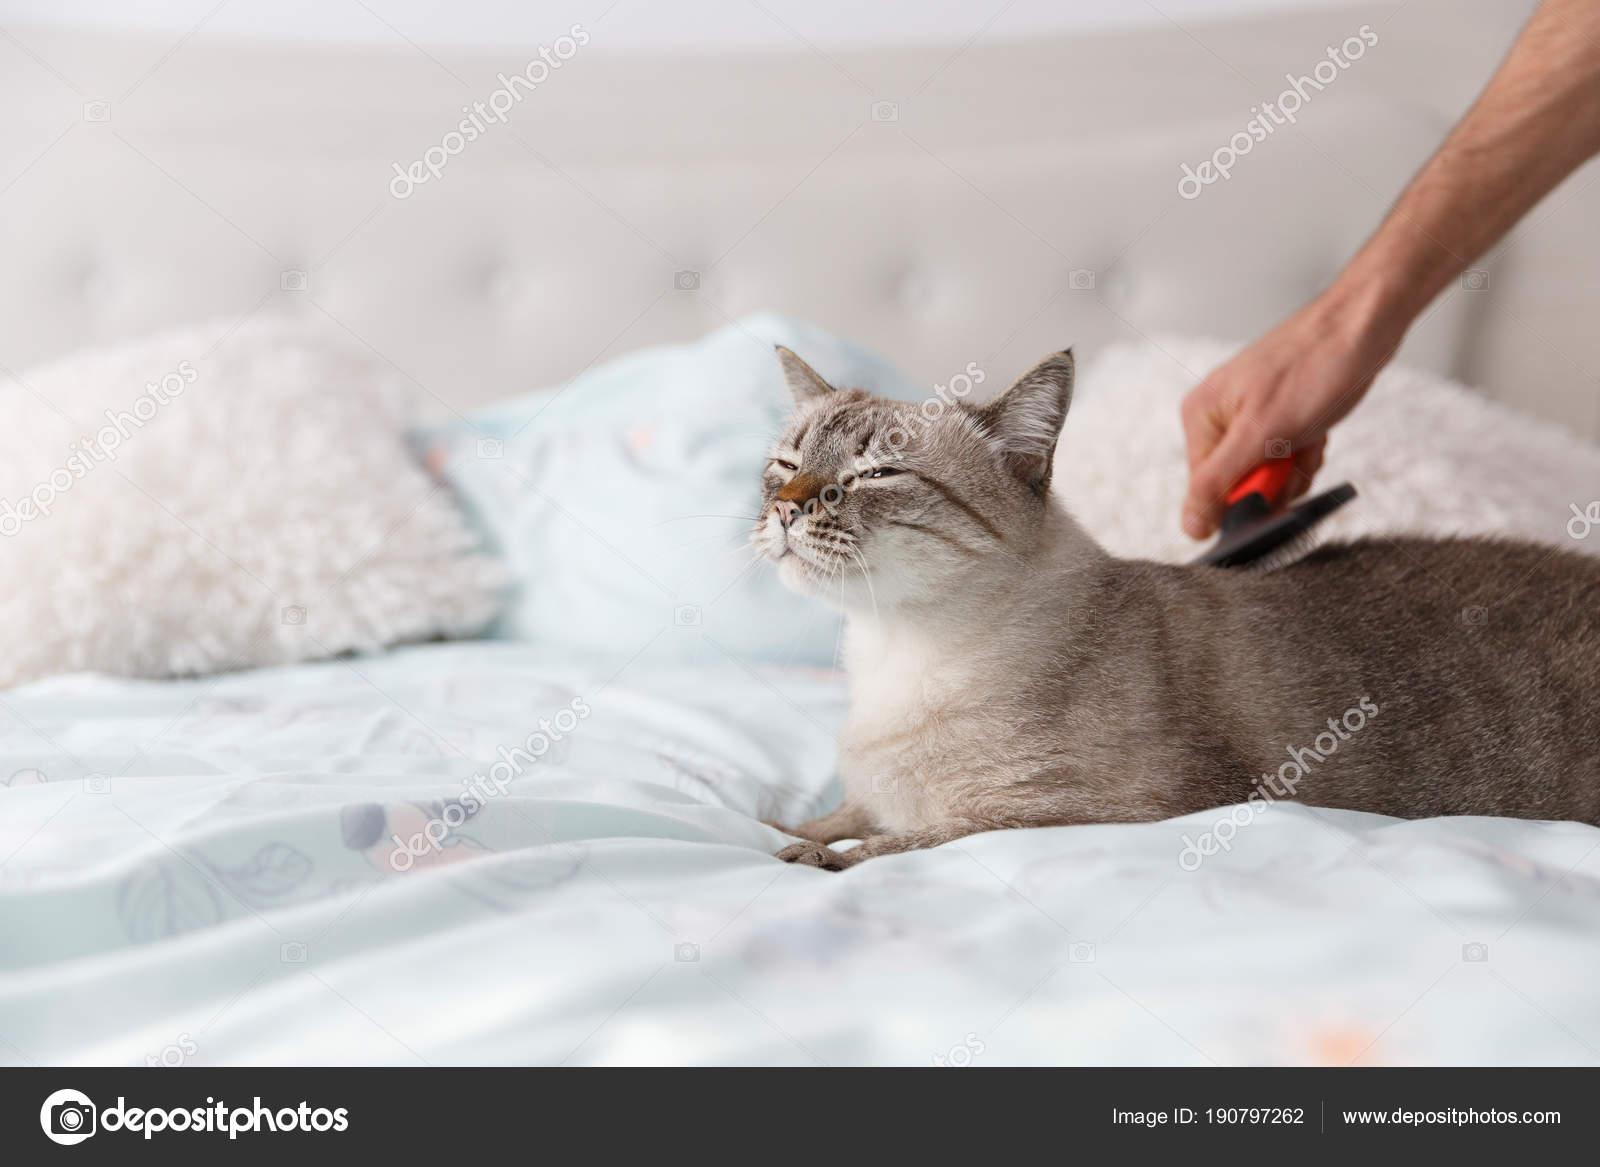 58cfcfb18312 Εσωτερική κοντή τρίχα γάτας σε χαλάρωση διάθεση. Ανθρώπινο χέρι να χαλάσει  την όμορφη γάτα με μια ειδική βούρτσα κατοικίδιων ζώων– εικόνα αρχείου